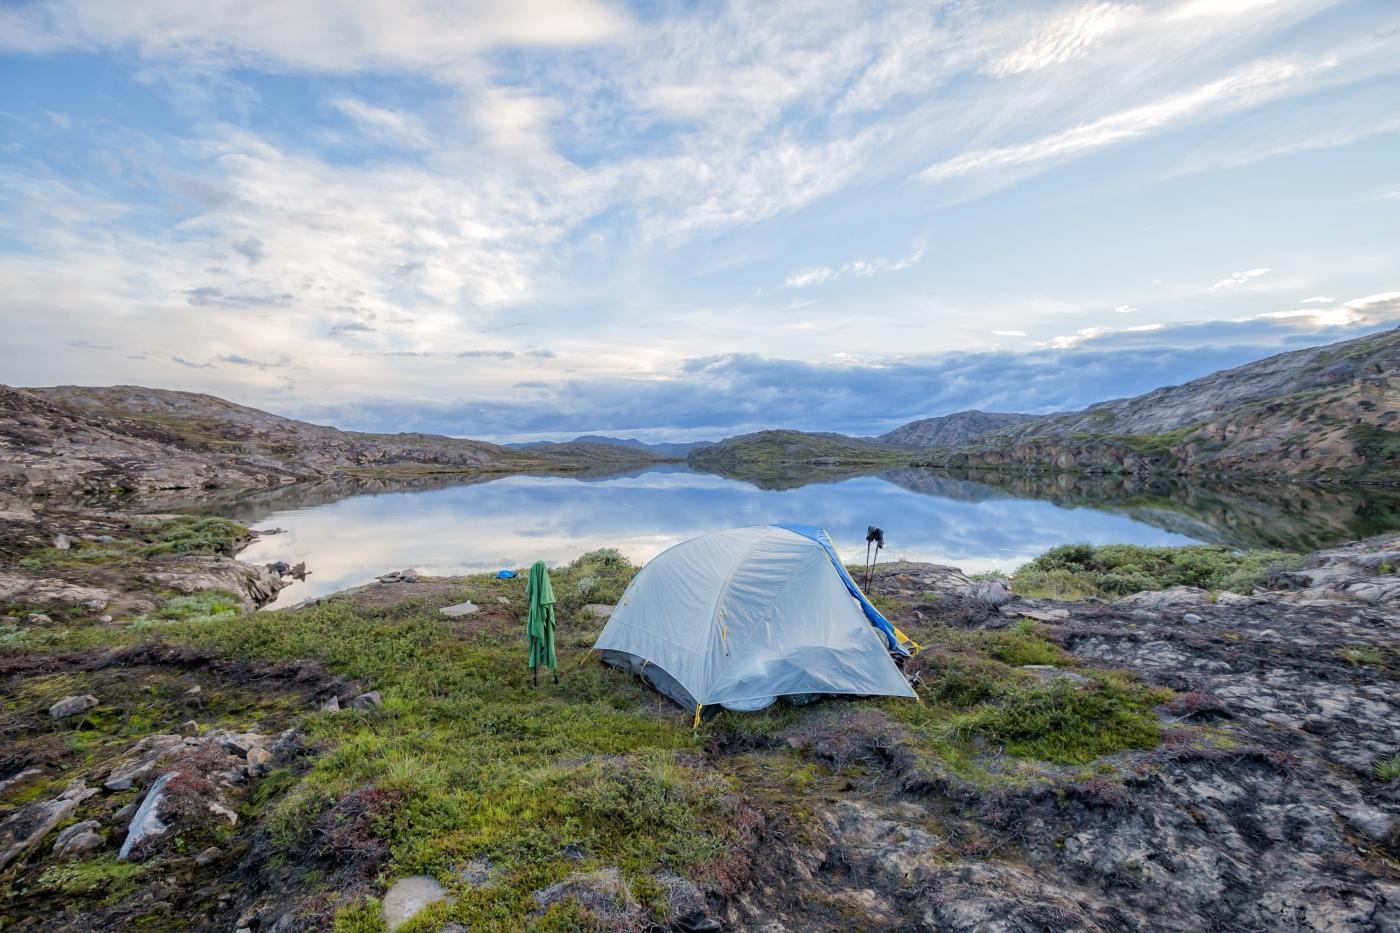 Tent camp on lake near Ikkattooq Hut on the Arctic Circle Trail. Photo by Lina Stock